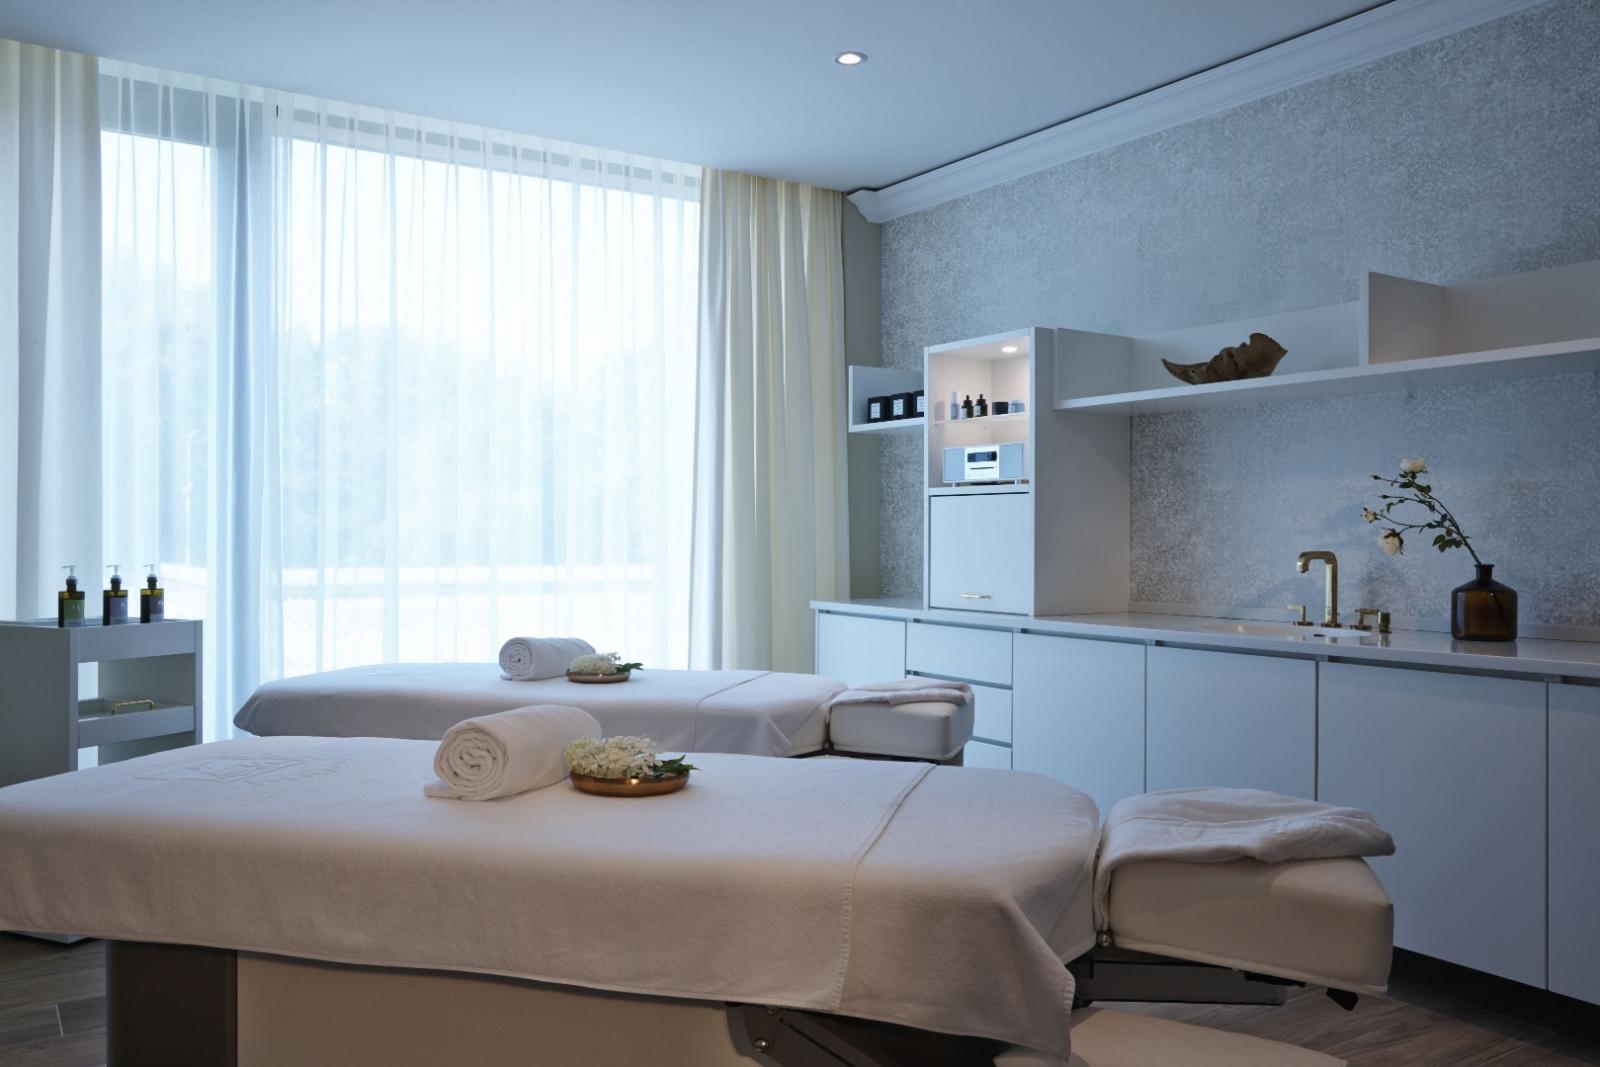 luxus country club spa package angebot im wellnesshotel kempinski hotel frankfurt. Black Bedroom Furniture Sets. Home Design Ideas